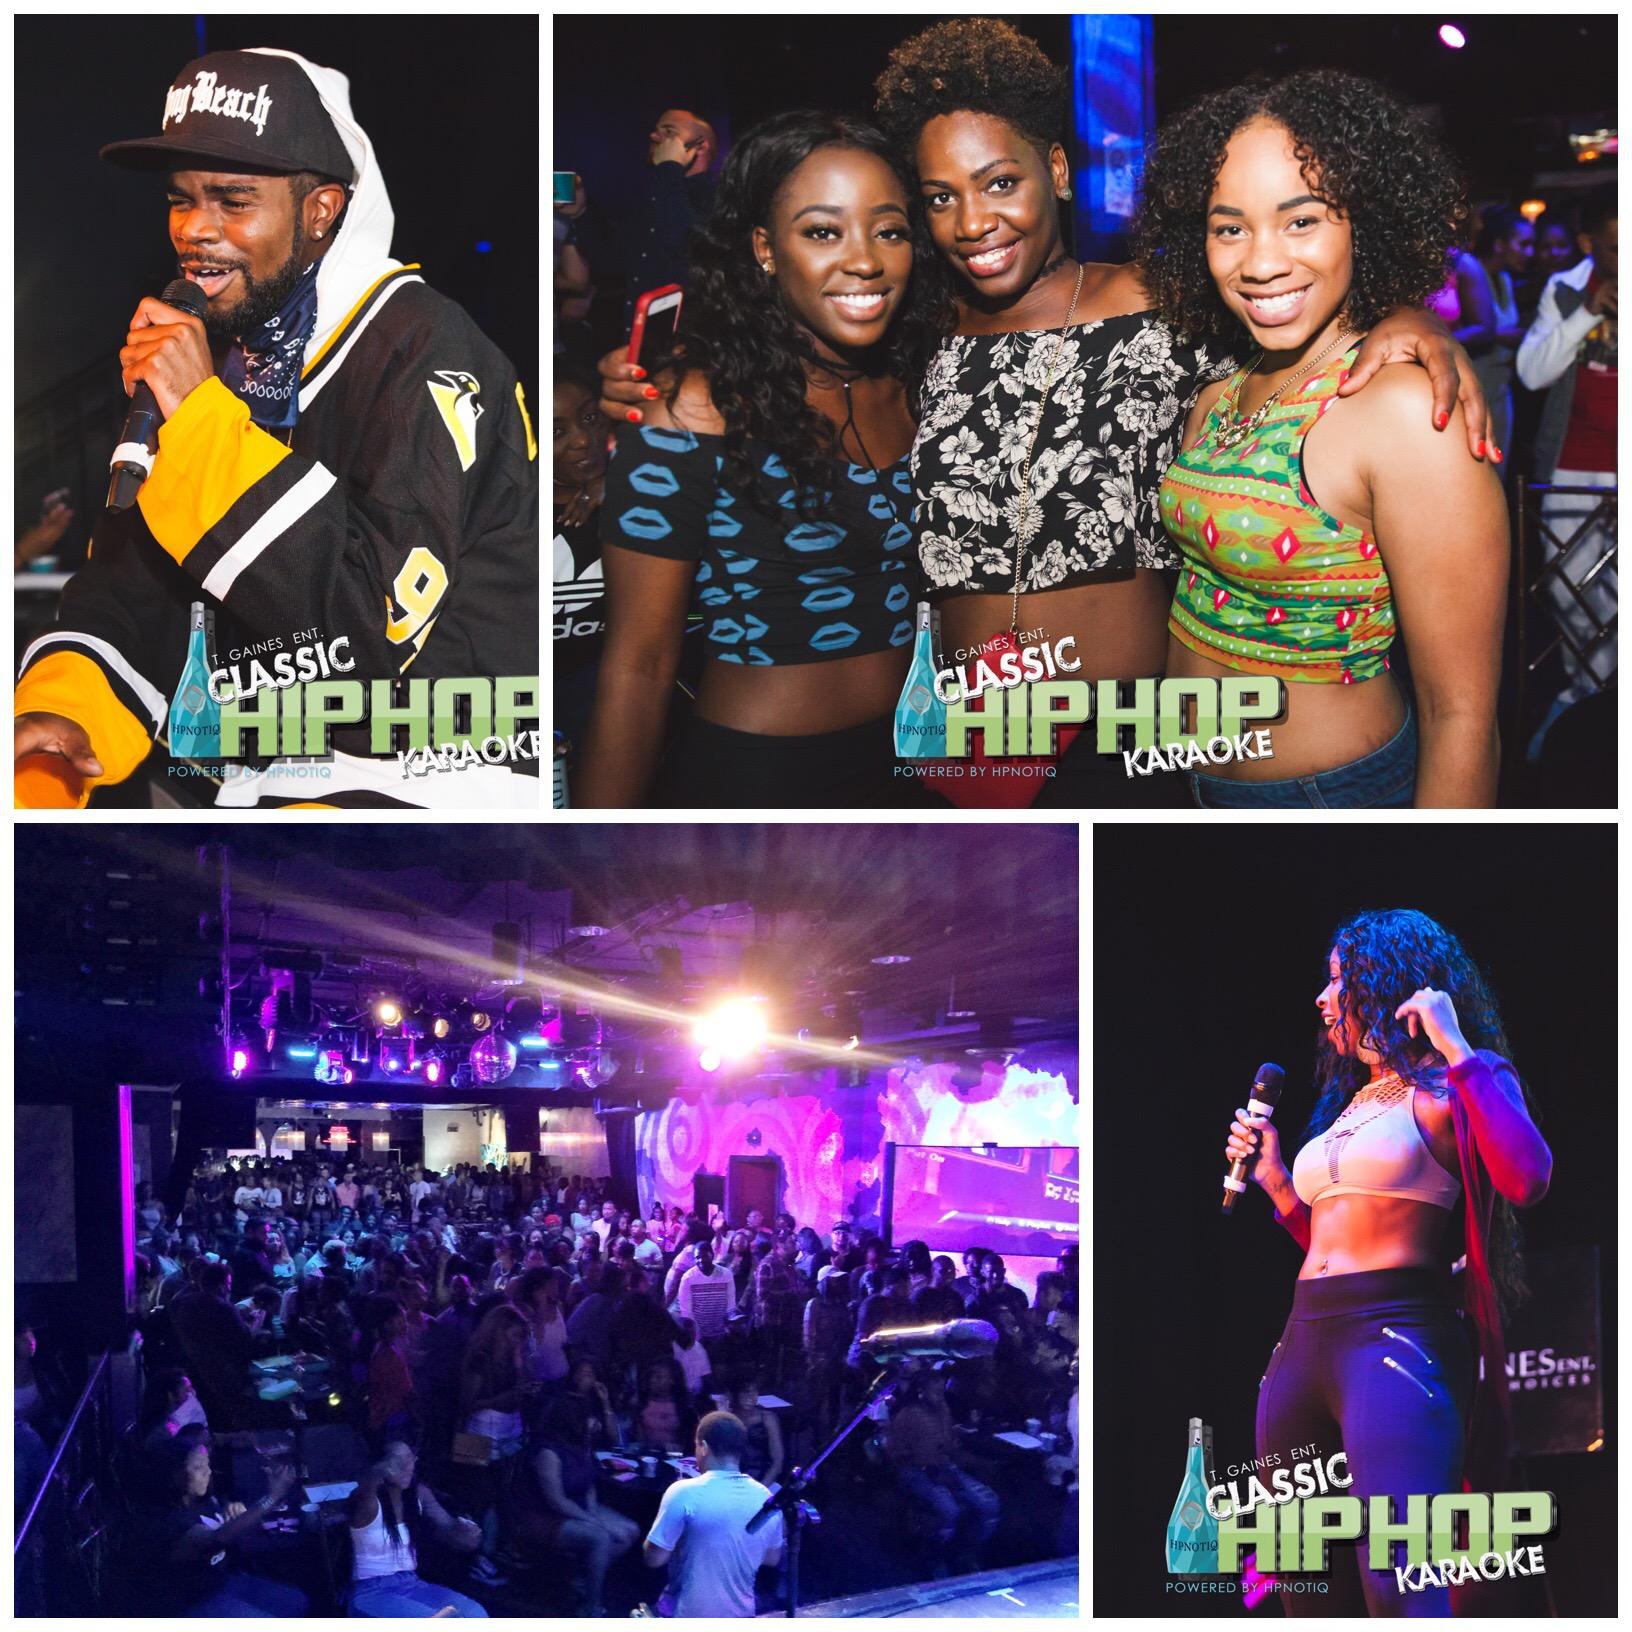 Classic Hip Hop Karaoke Championship Series PART2 JULY 29th